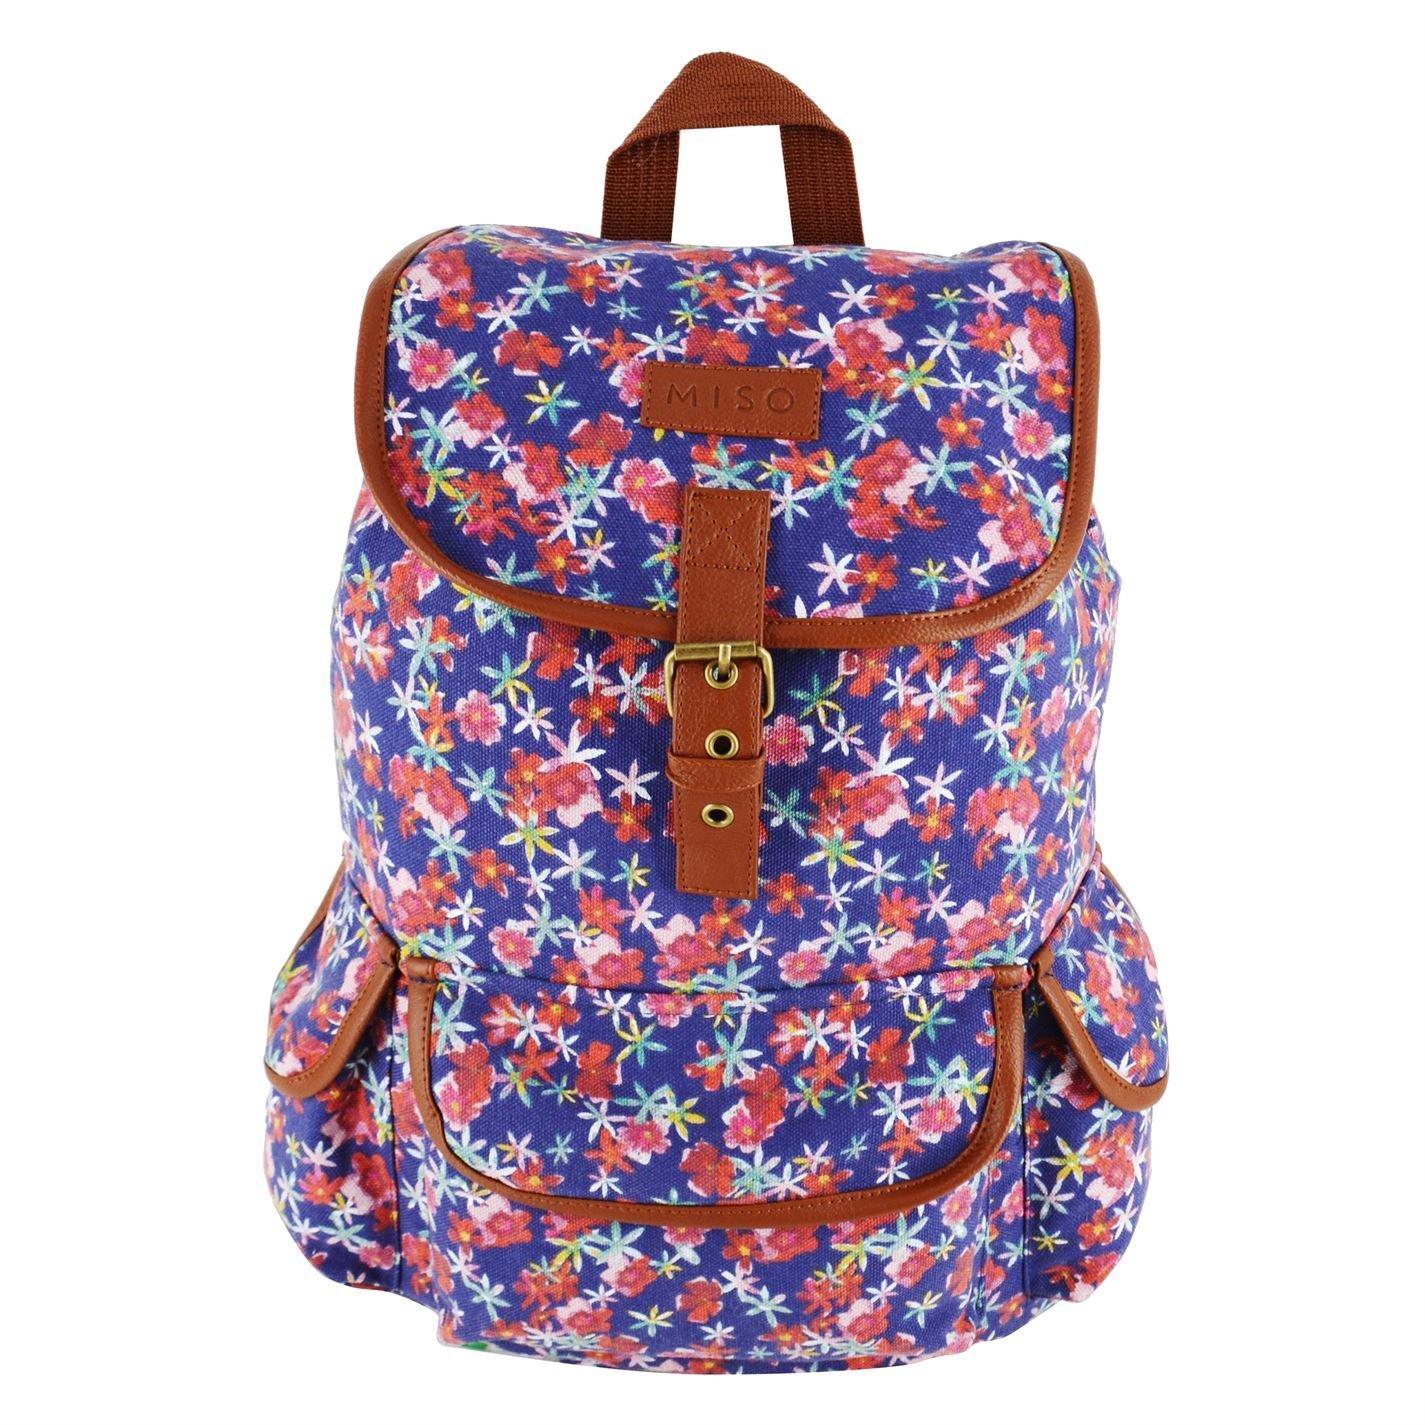 Miso Womens Canvas Backpack Back Pack Print Drawstring Printed